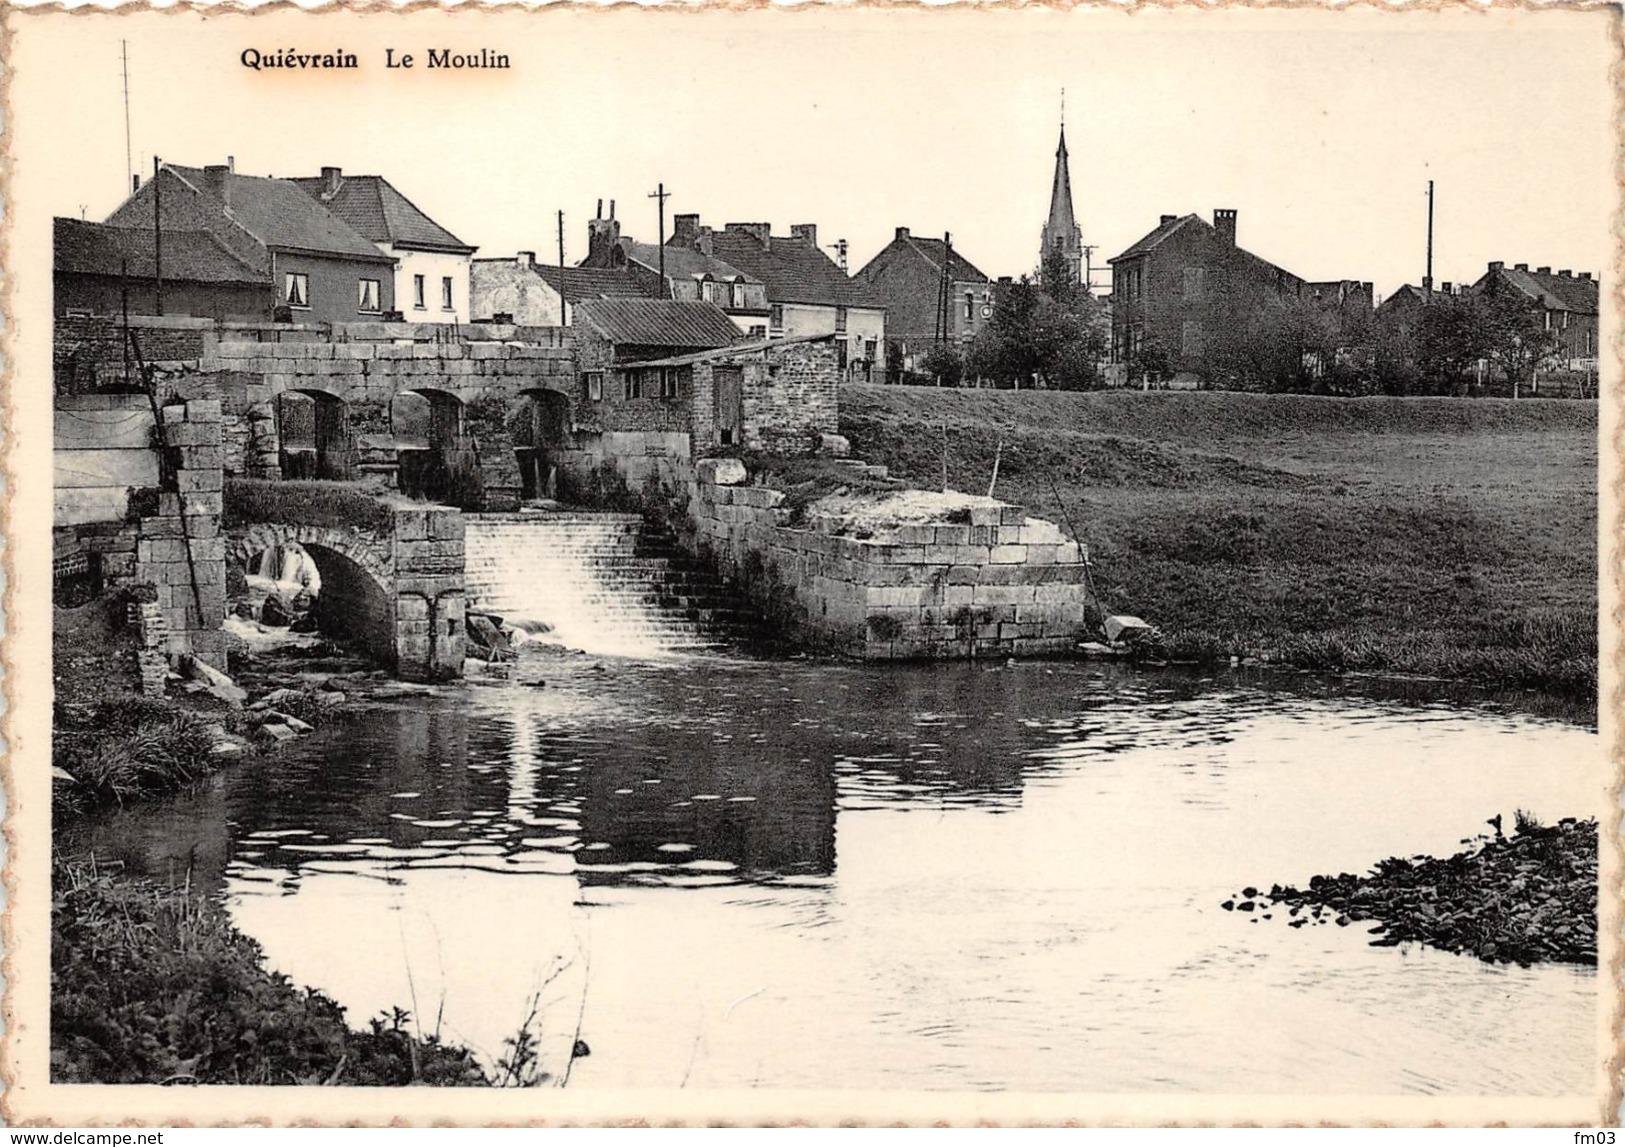 Quiévrain Moulin - Quiévrain